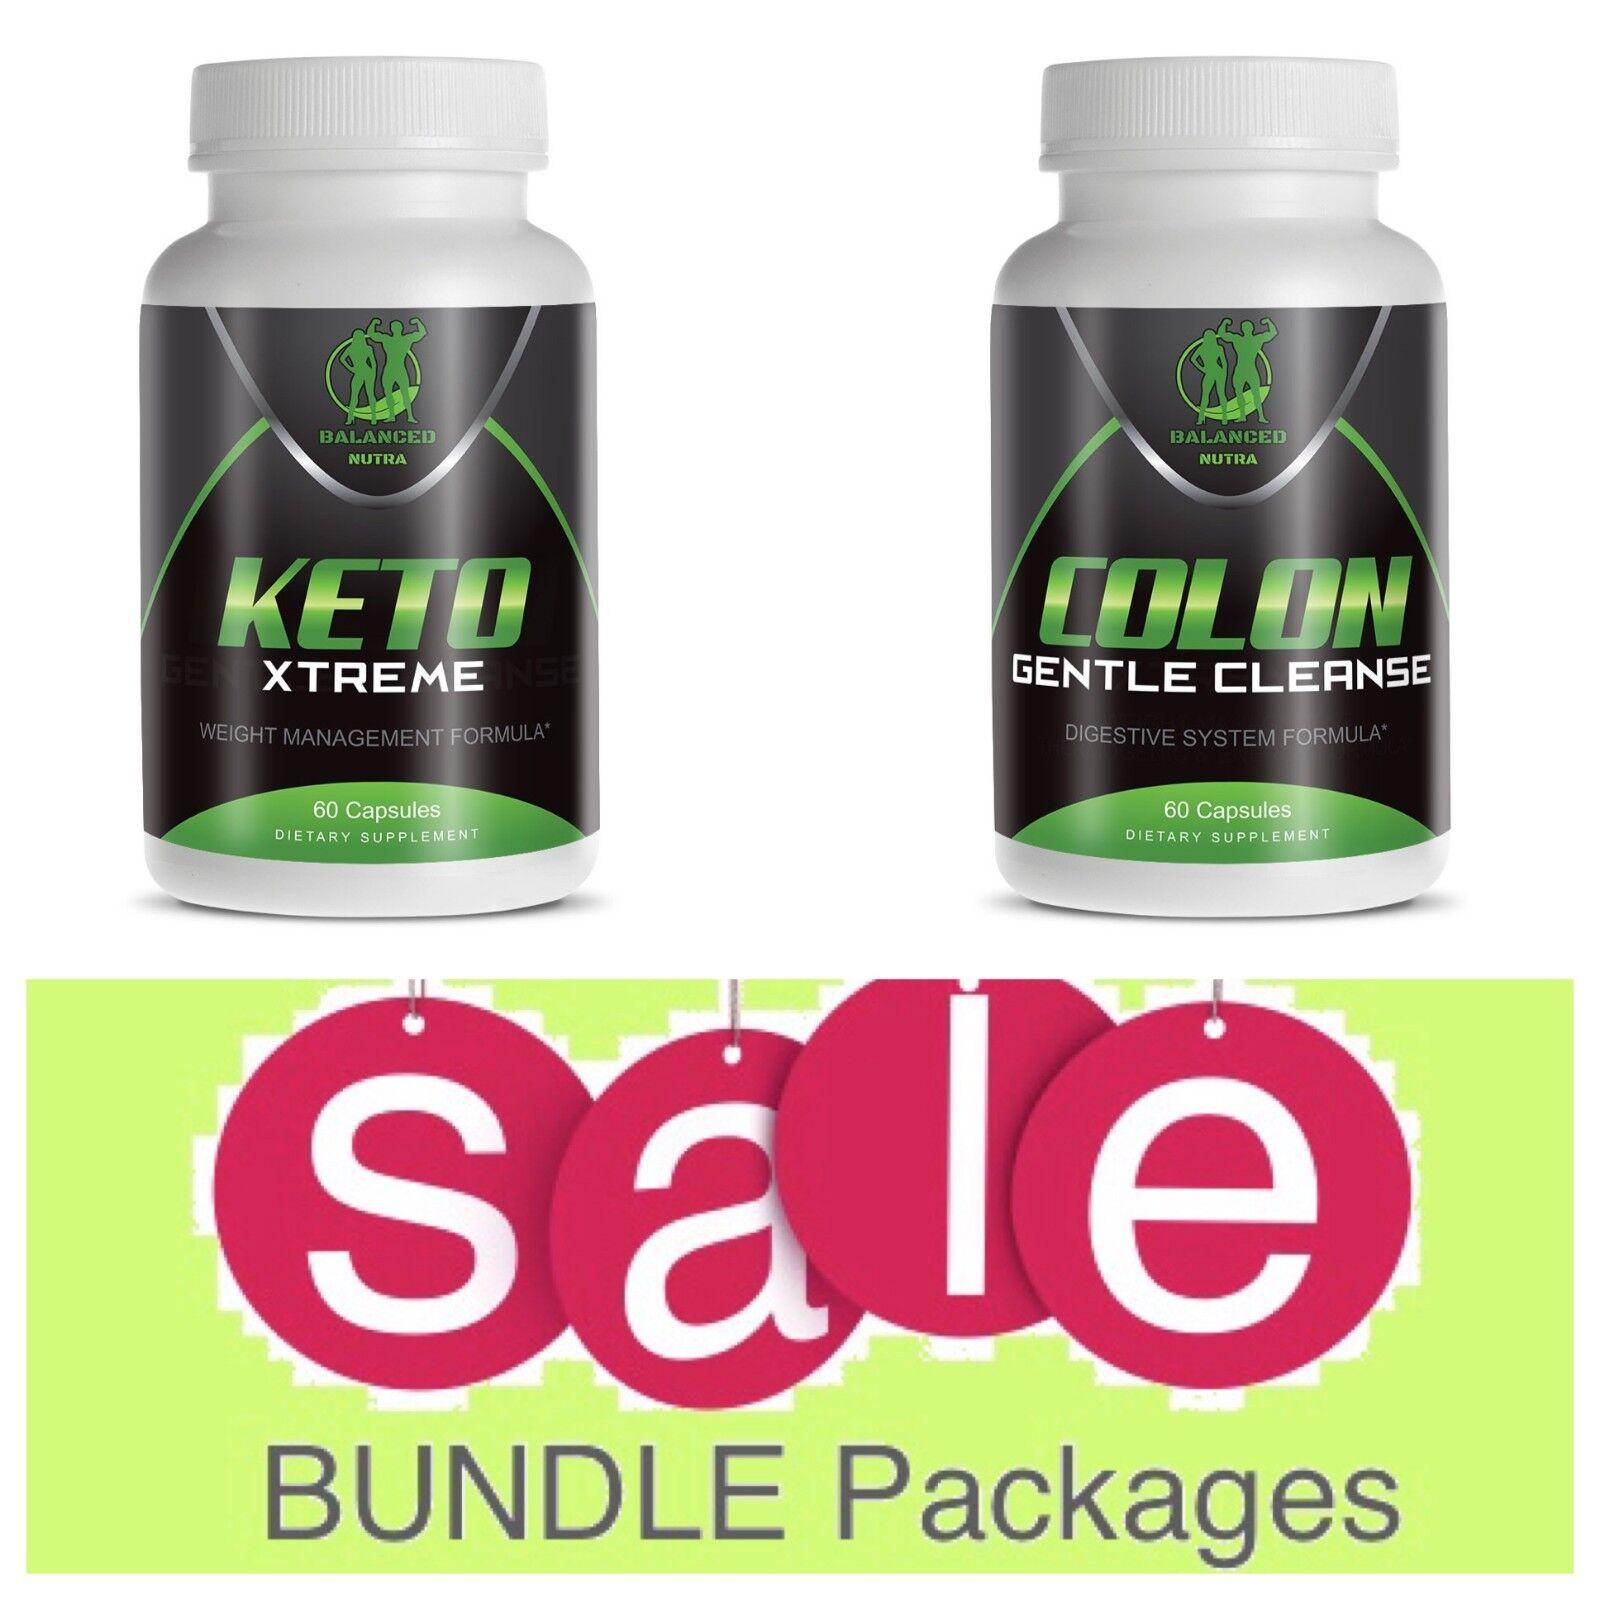 SALE Keto Diet Pills Keto xtreme Best Weight Loss Supplement